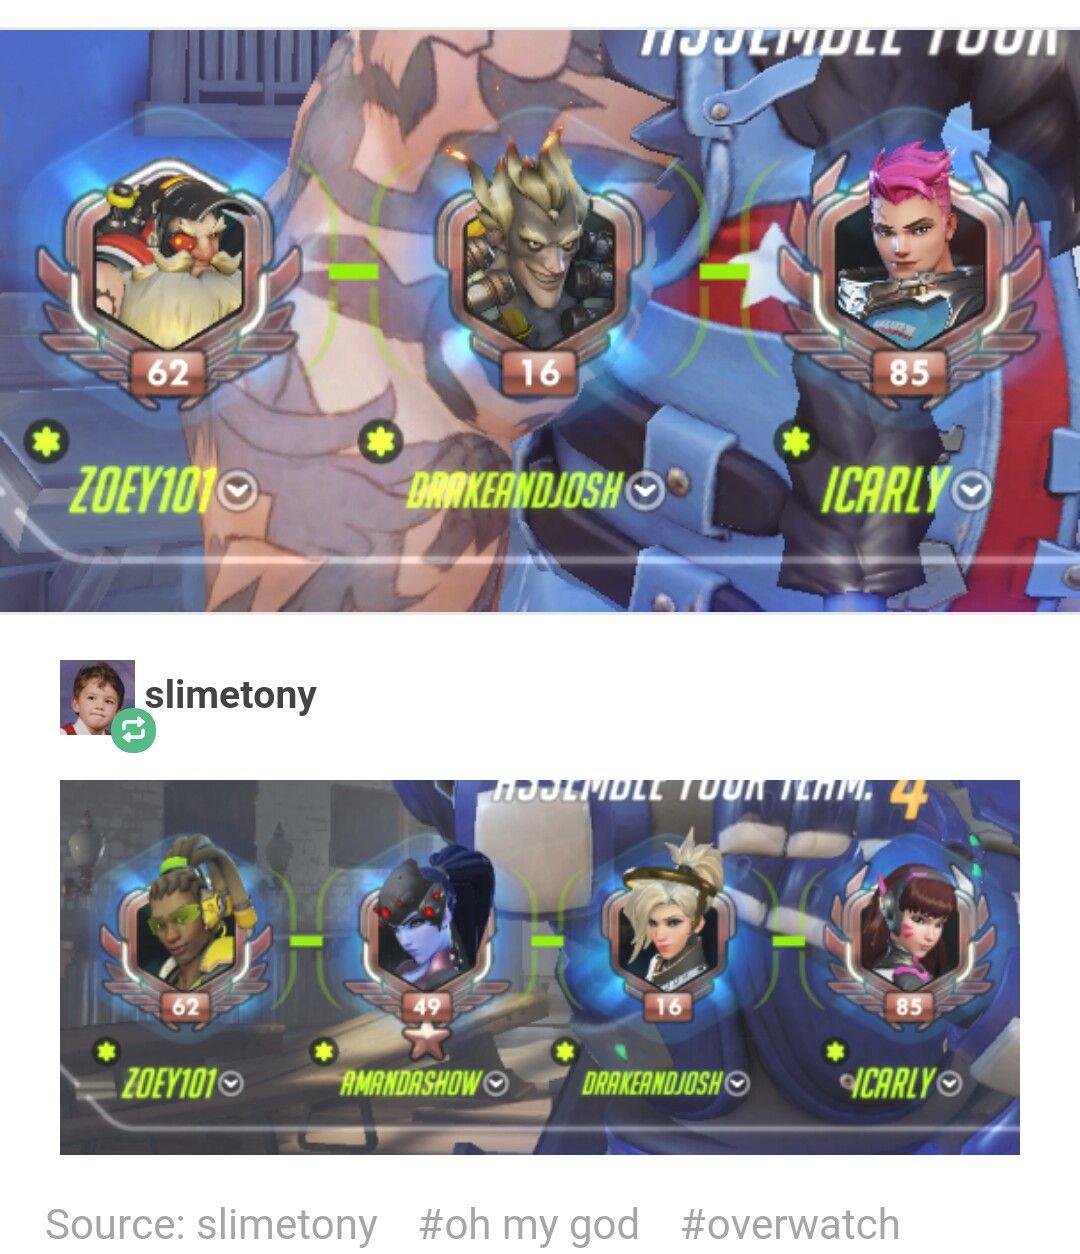 Dream Team Overwatch Funny Overwatch Comic Overwatch Memes